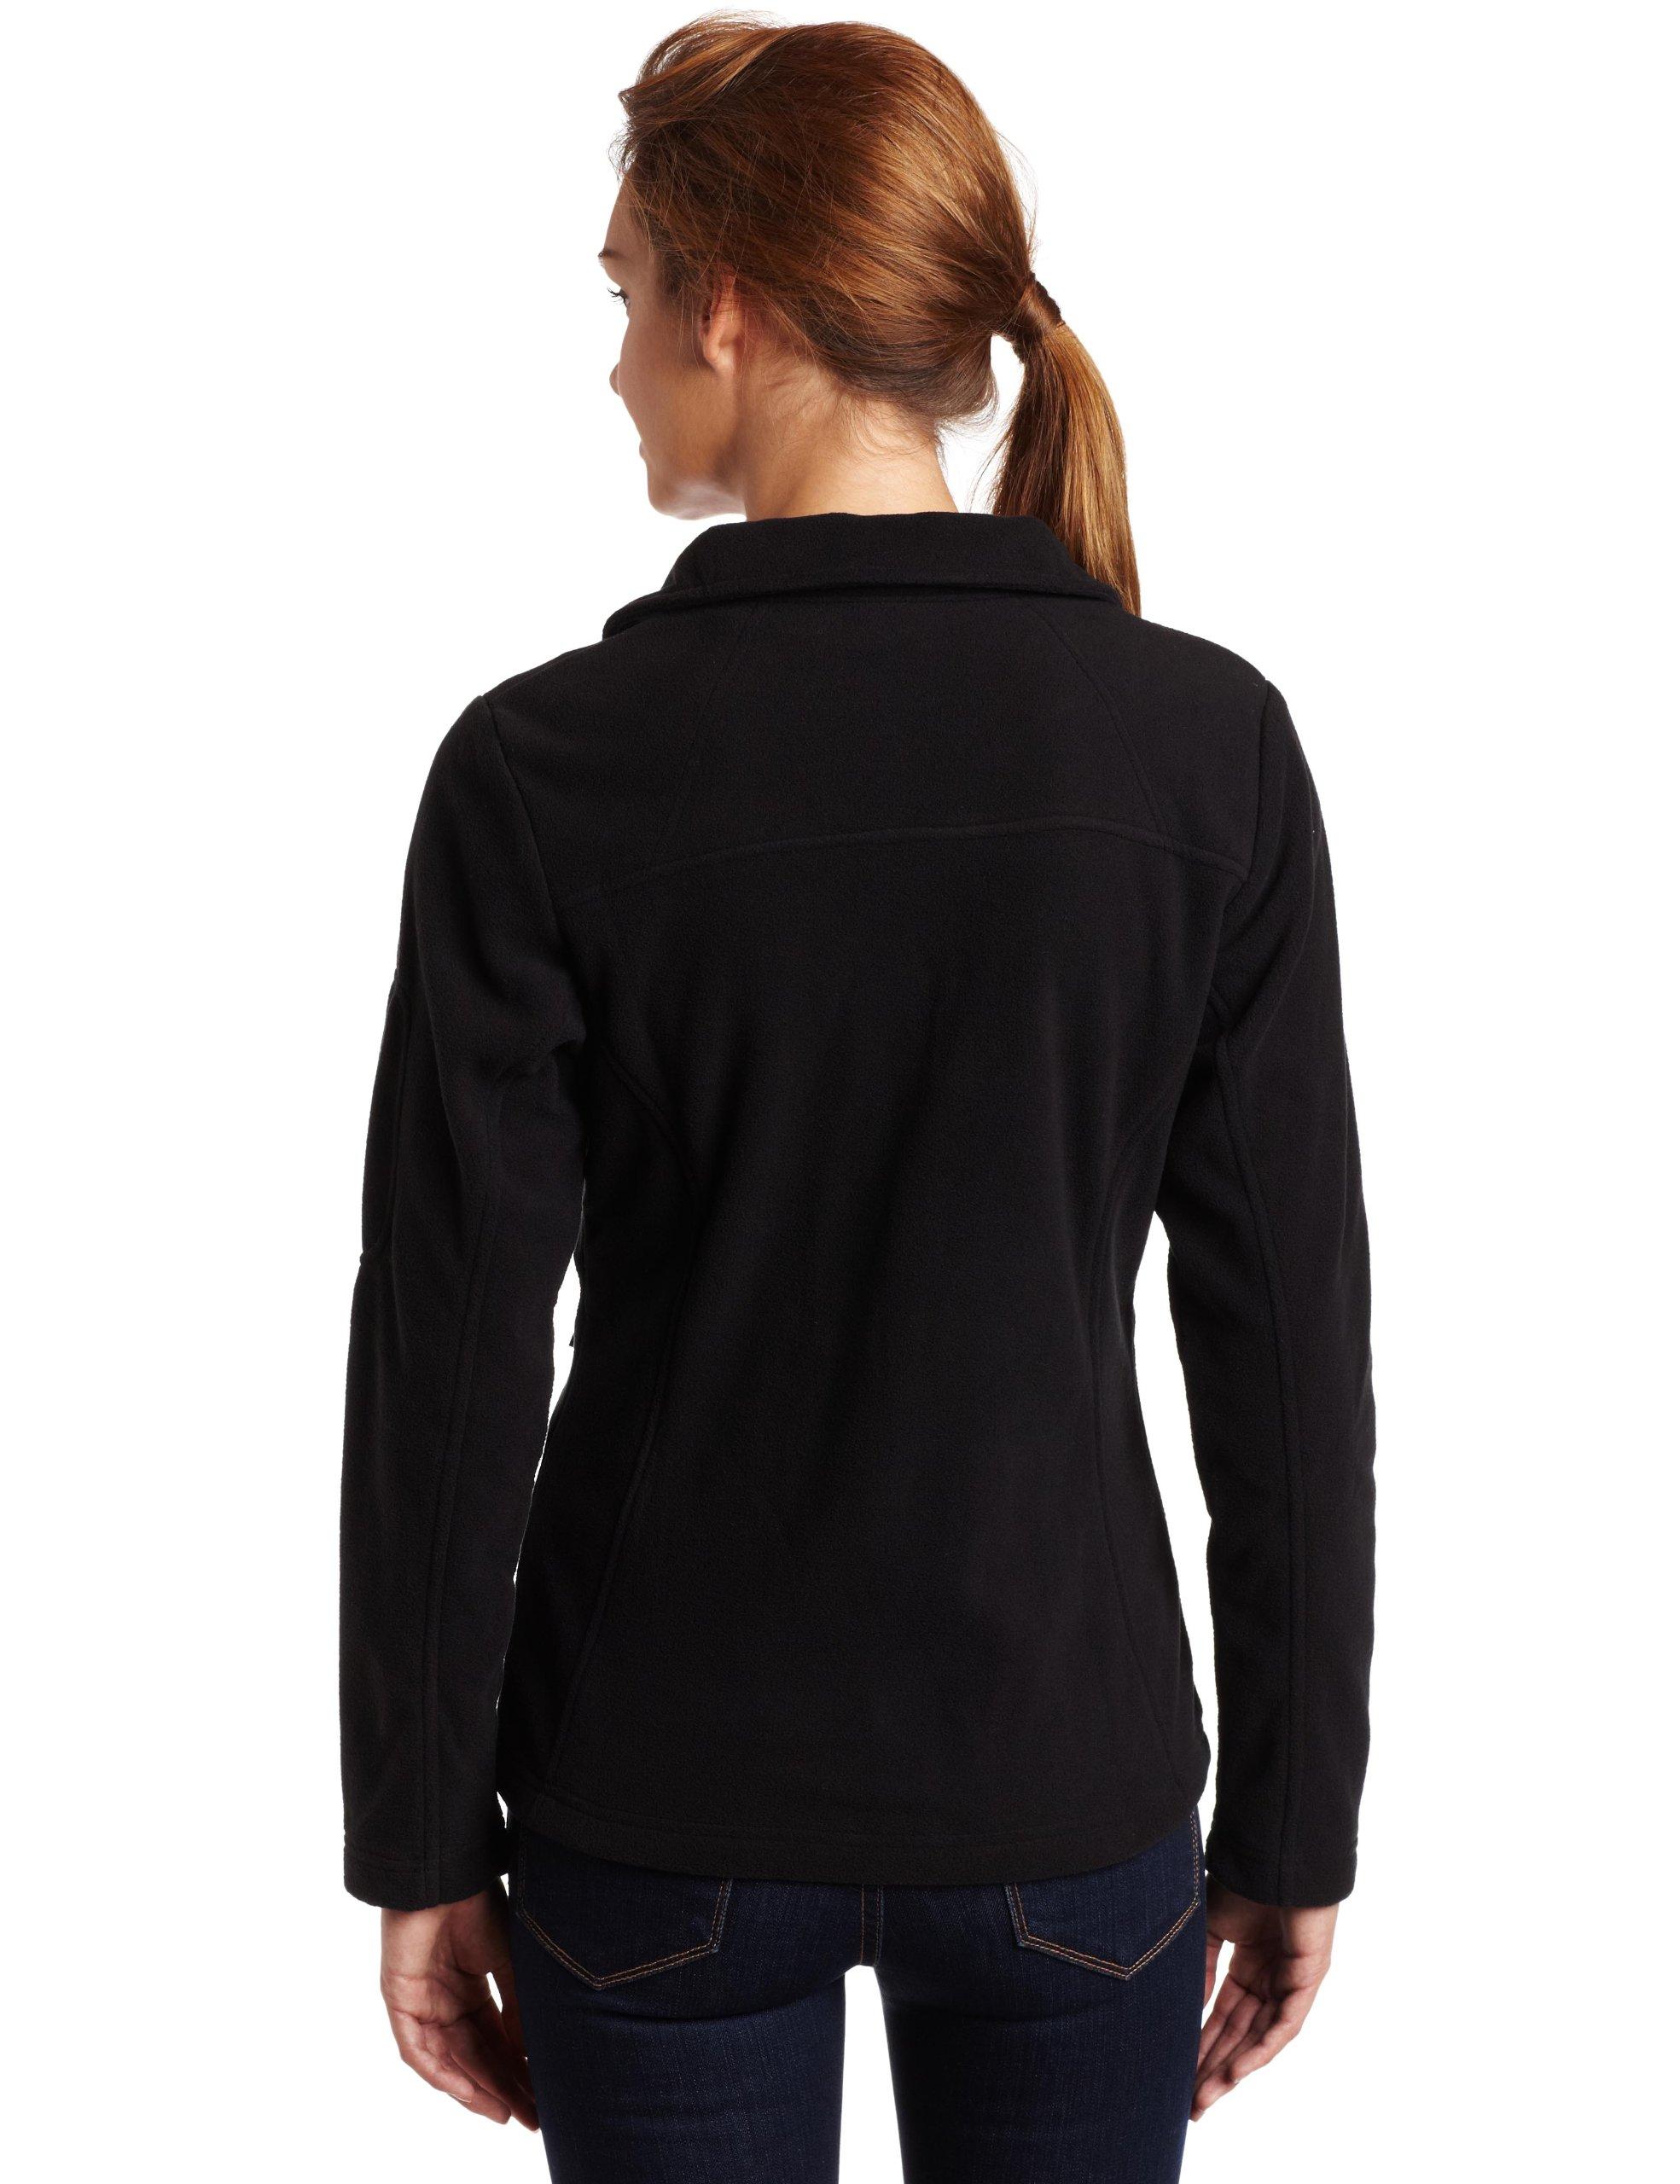 Columbia Women's Fast Trek Ii Full Zip Fleece Jacket Outerwear, black, XS by Columbia (Image #2)